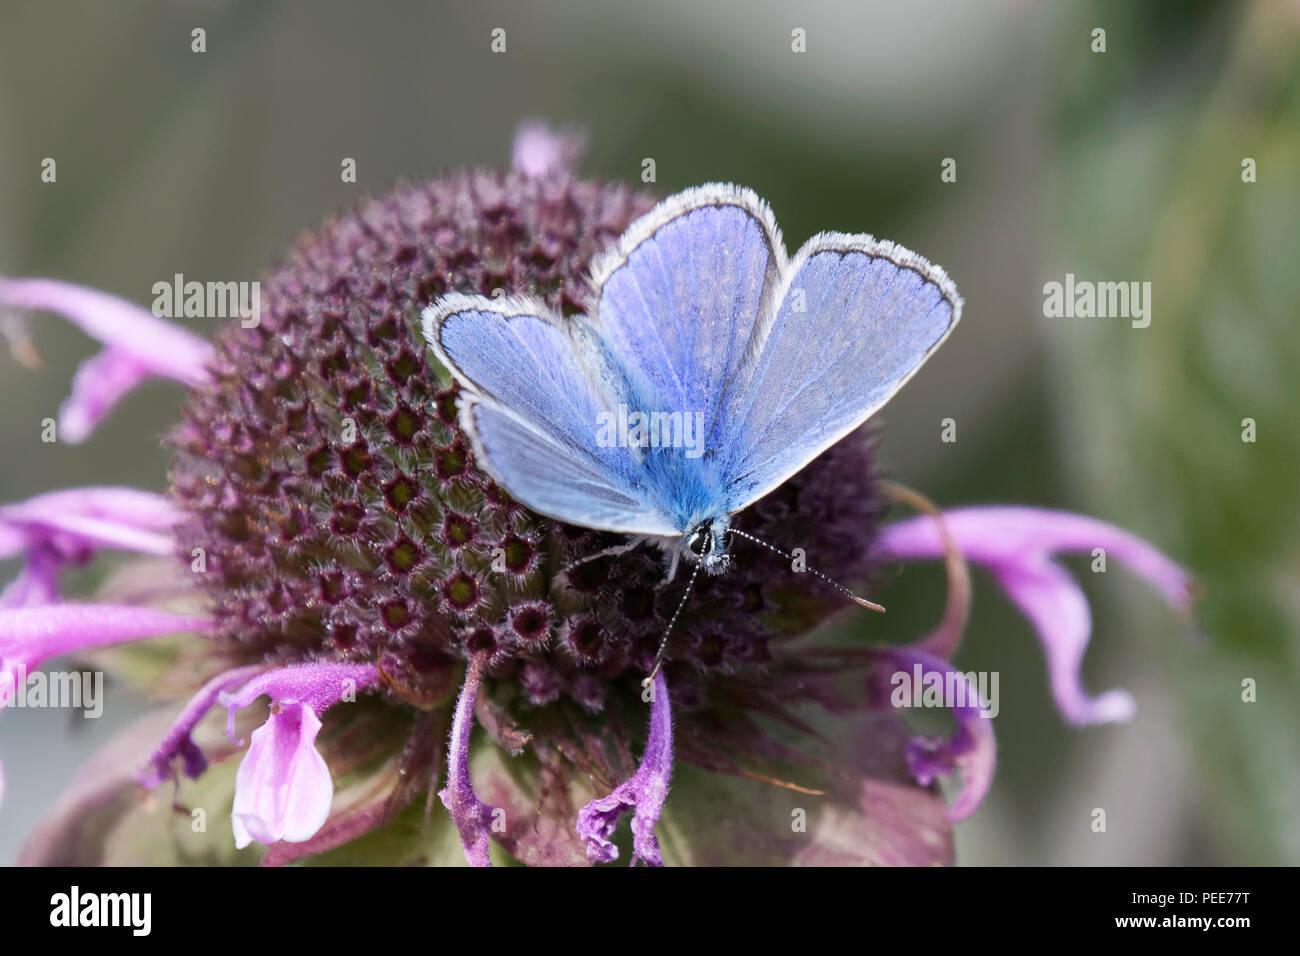 A male Common Blue butterfly feeding on a Monarda flower Stock Photo